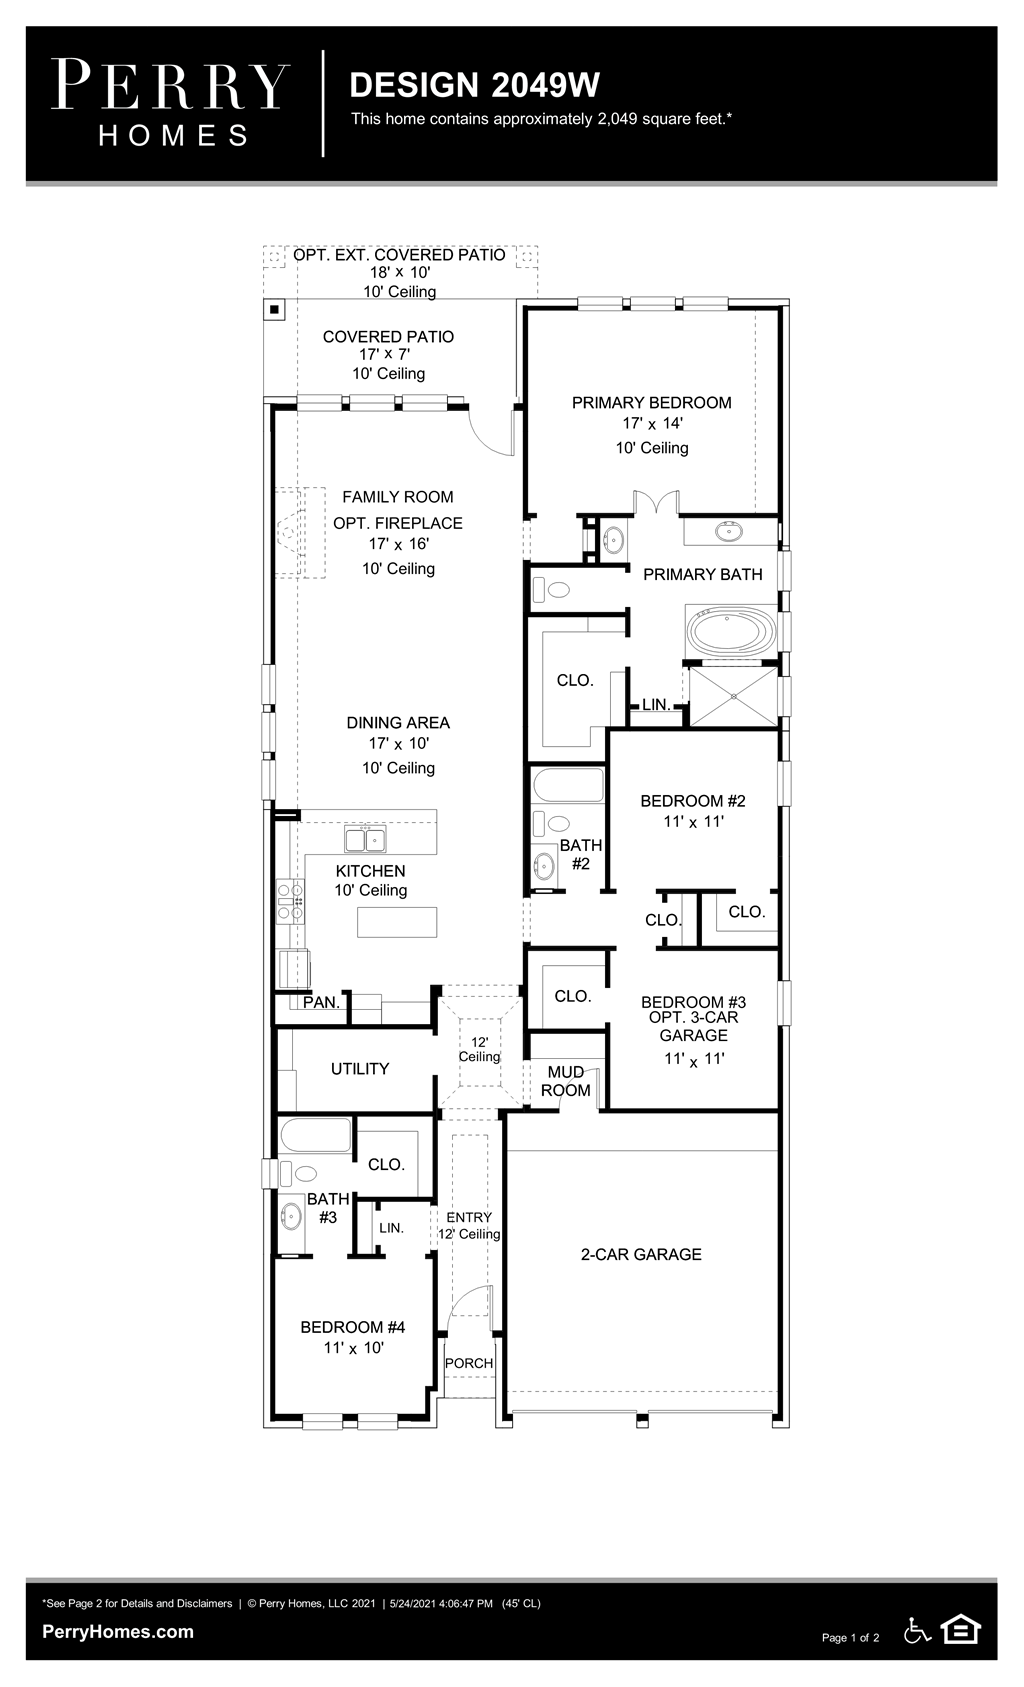 Floor Plan for 2049W